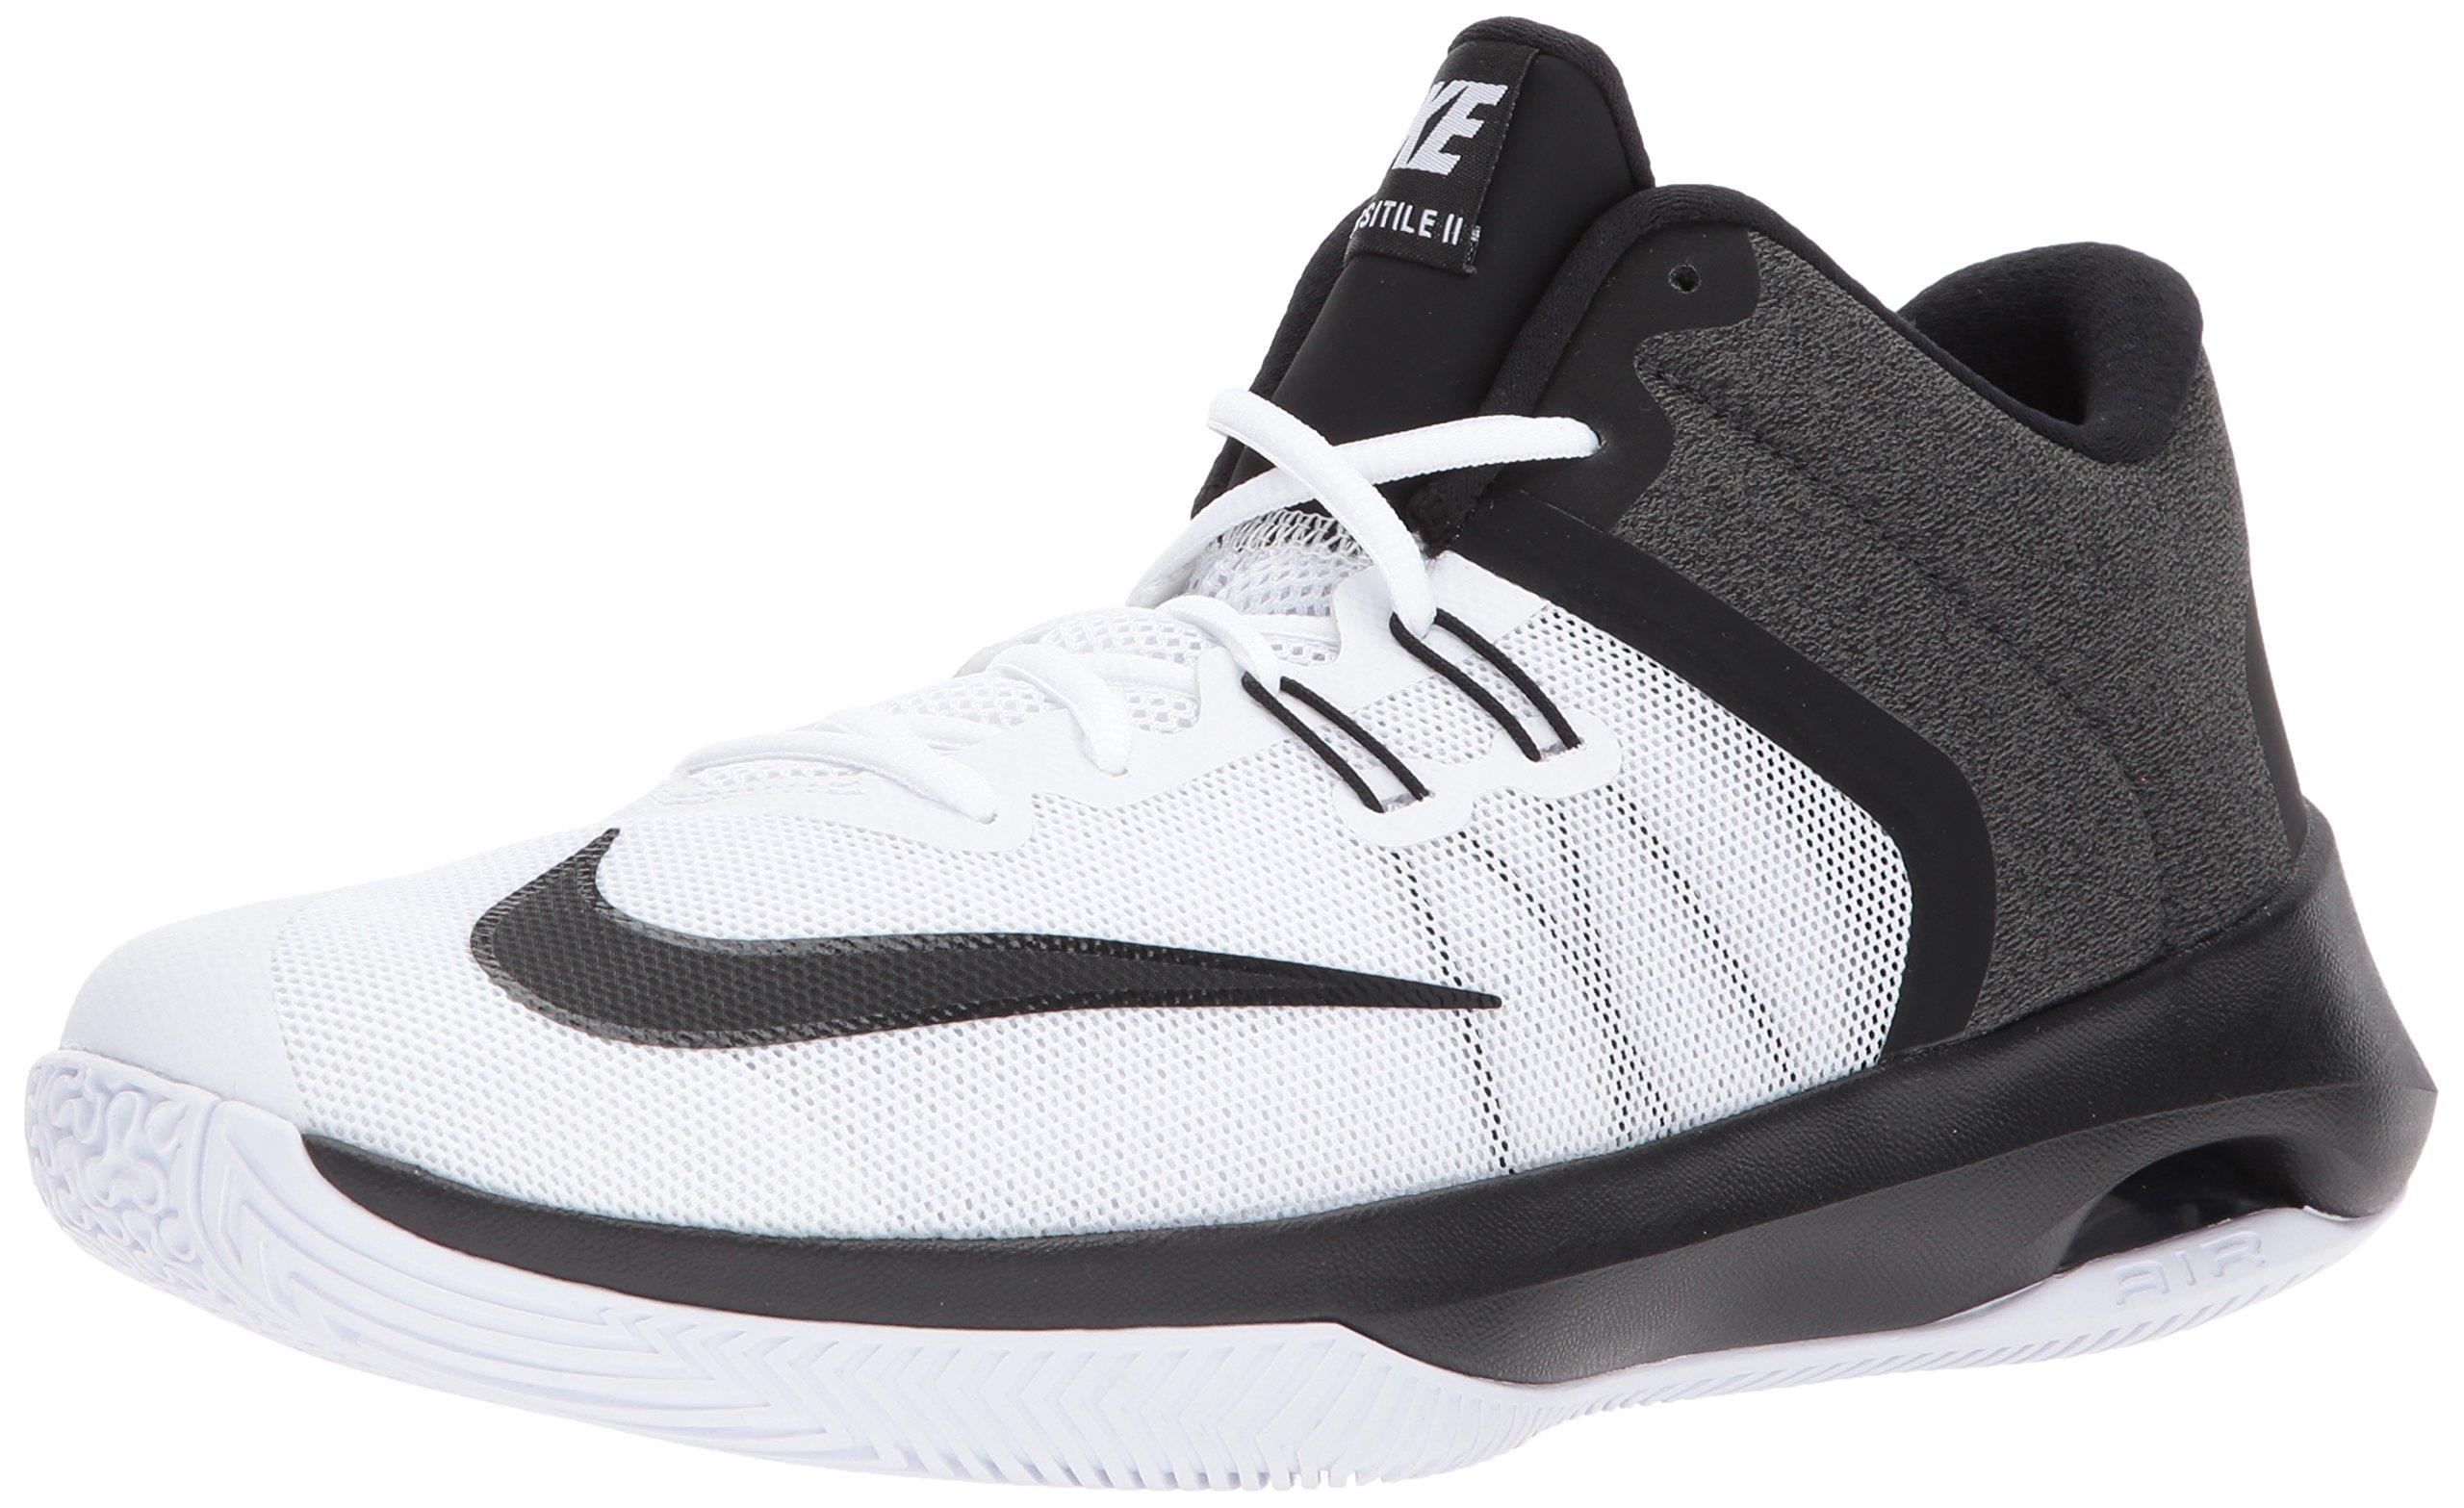 e3942185d79 Galleon - Nike Men s Air Versitile II Basketball Shoe